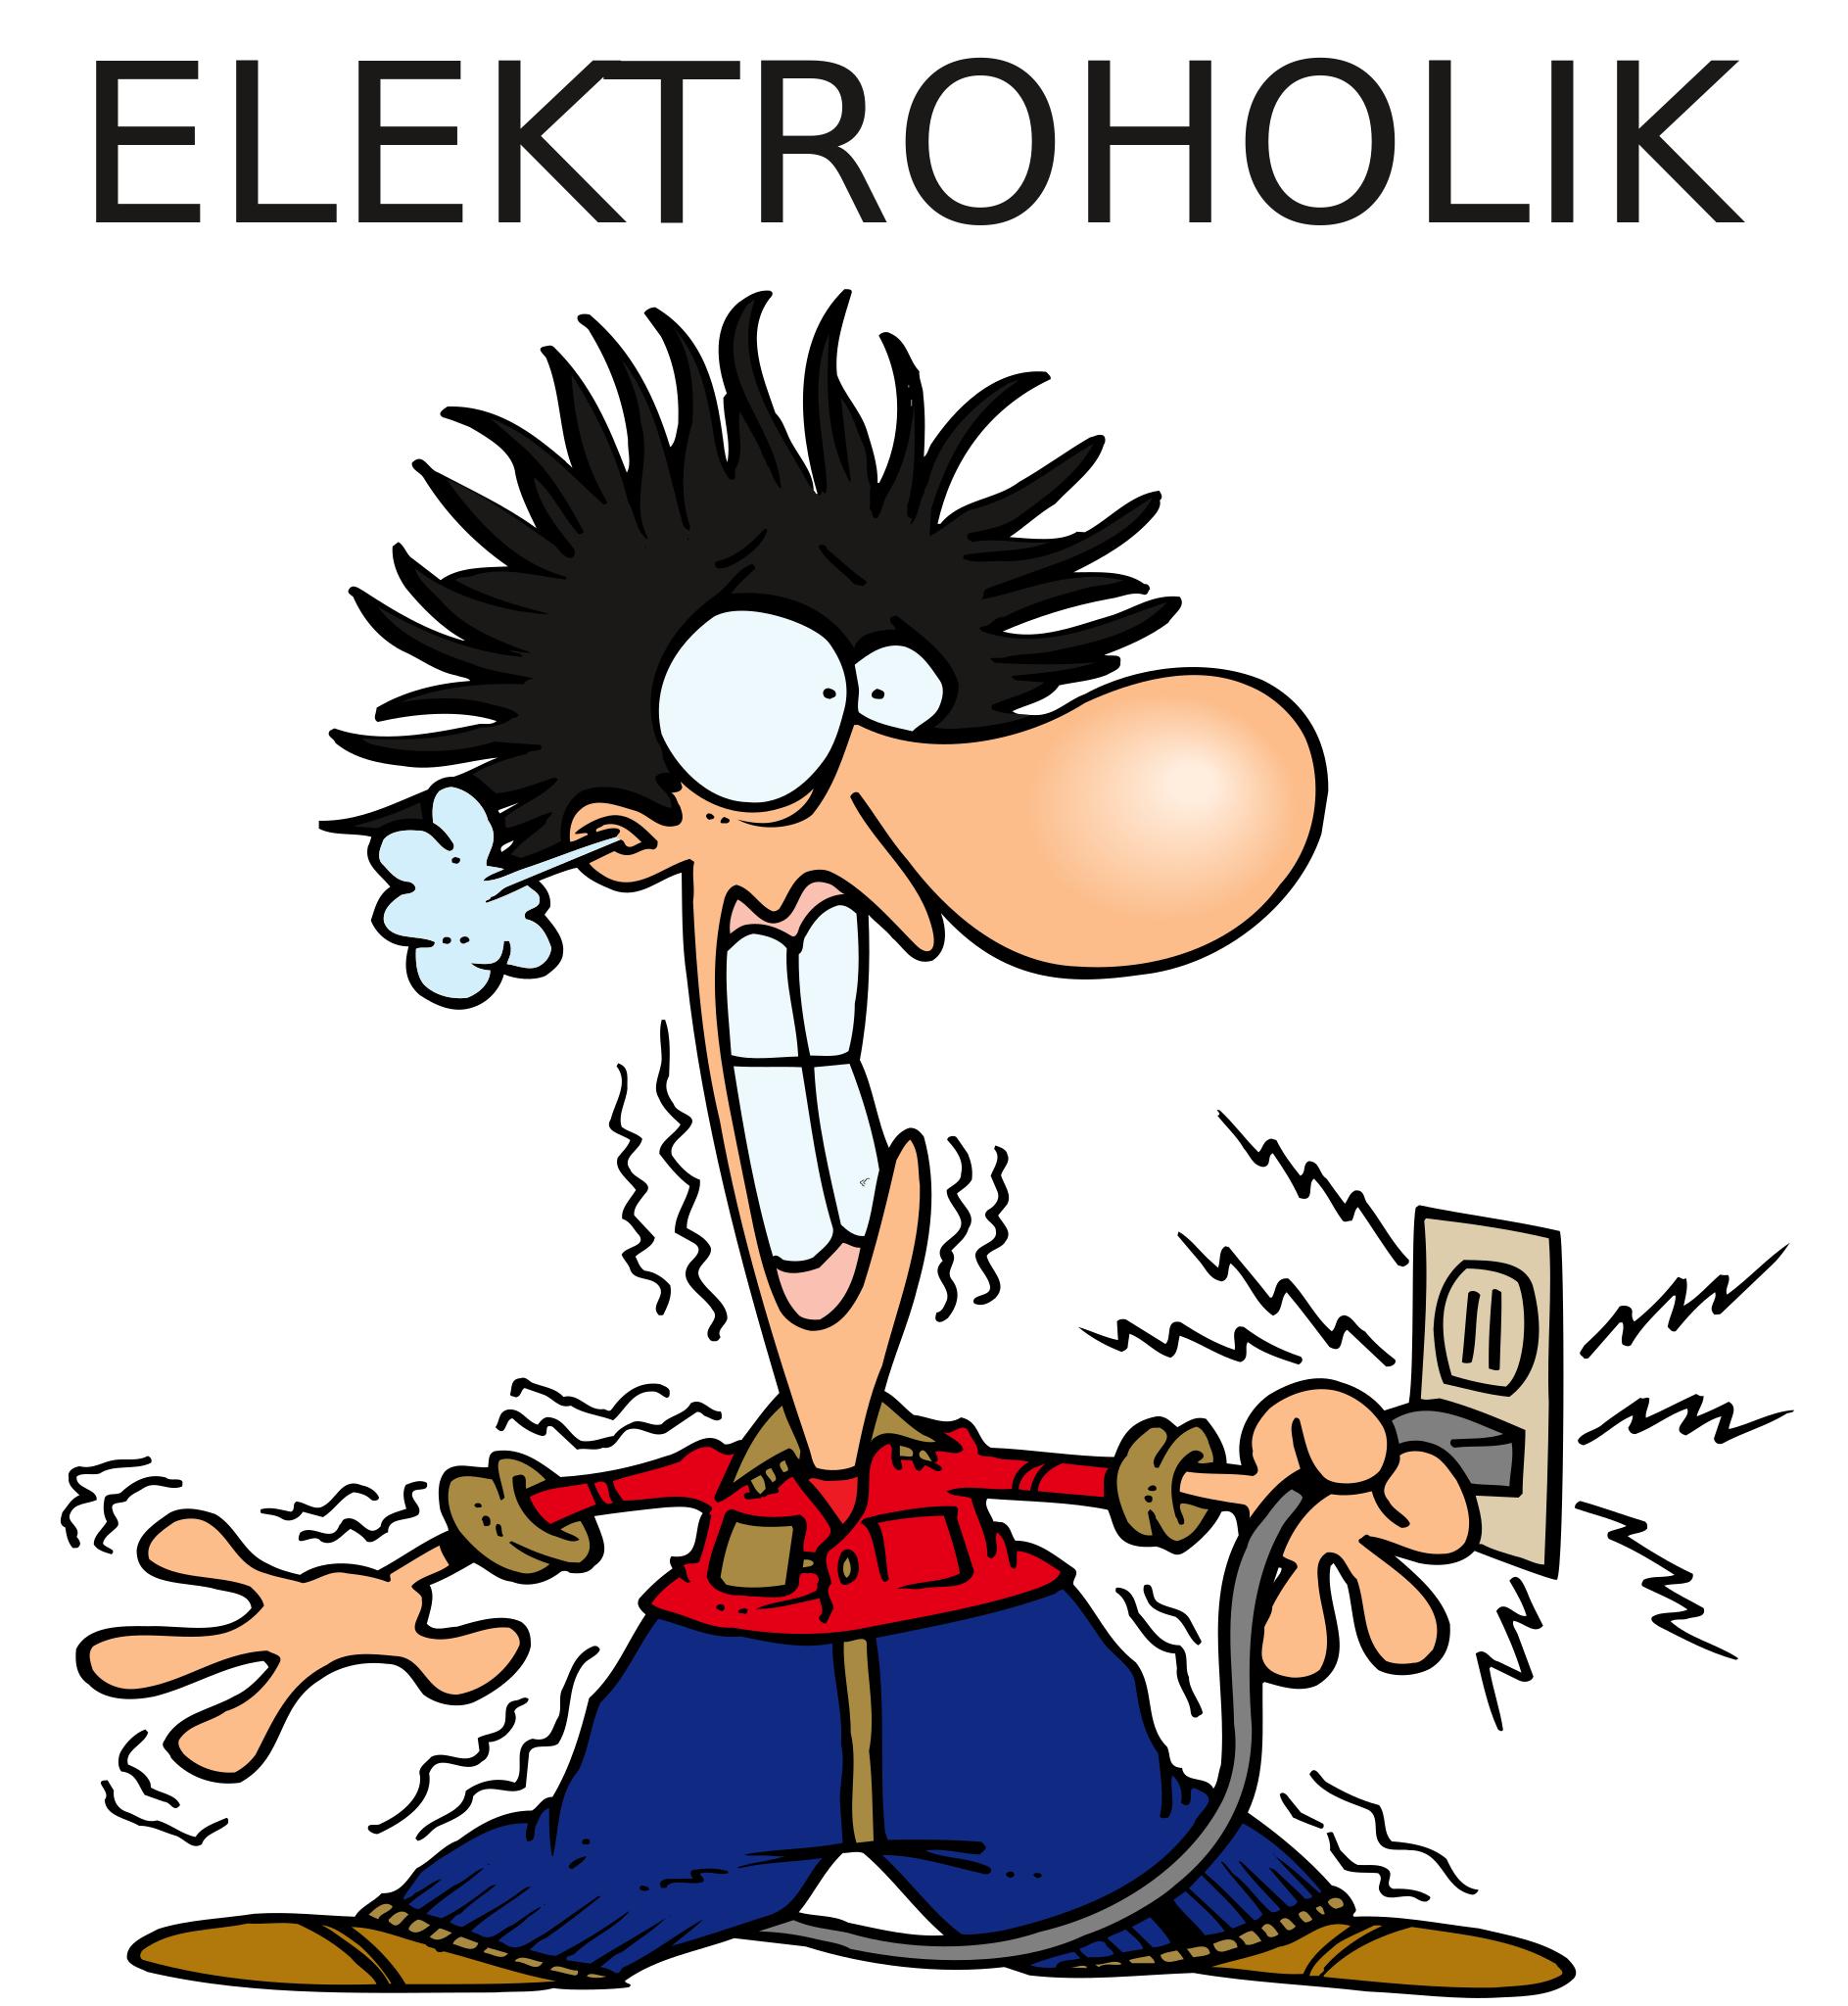 Elektroholik